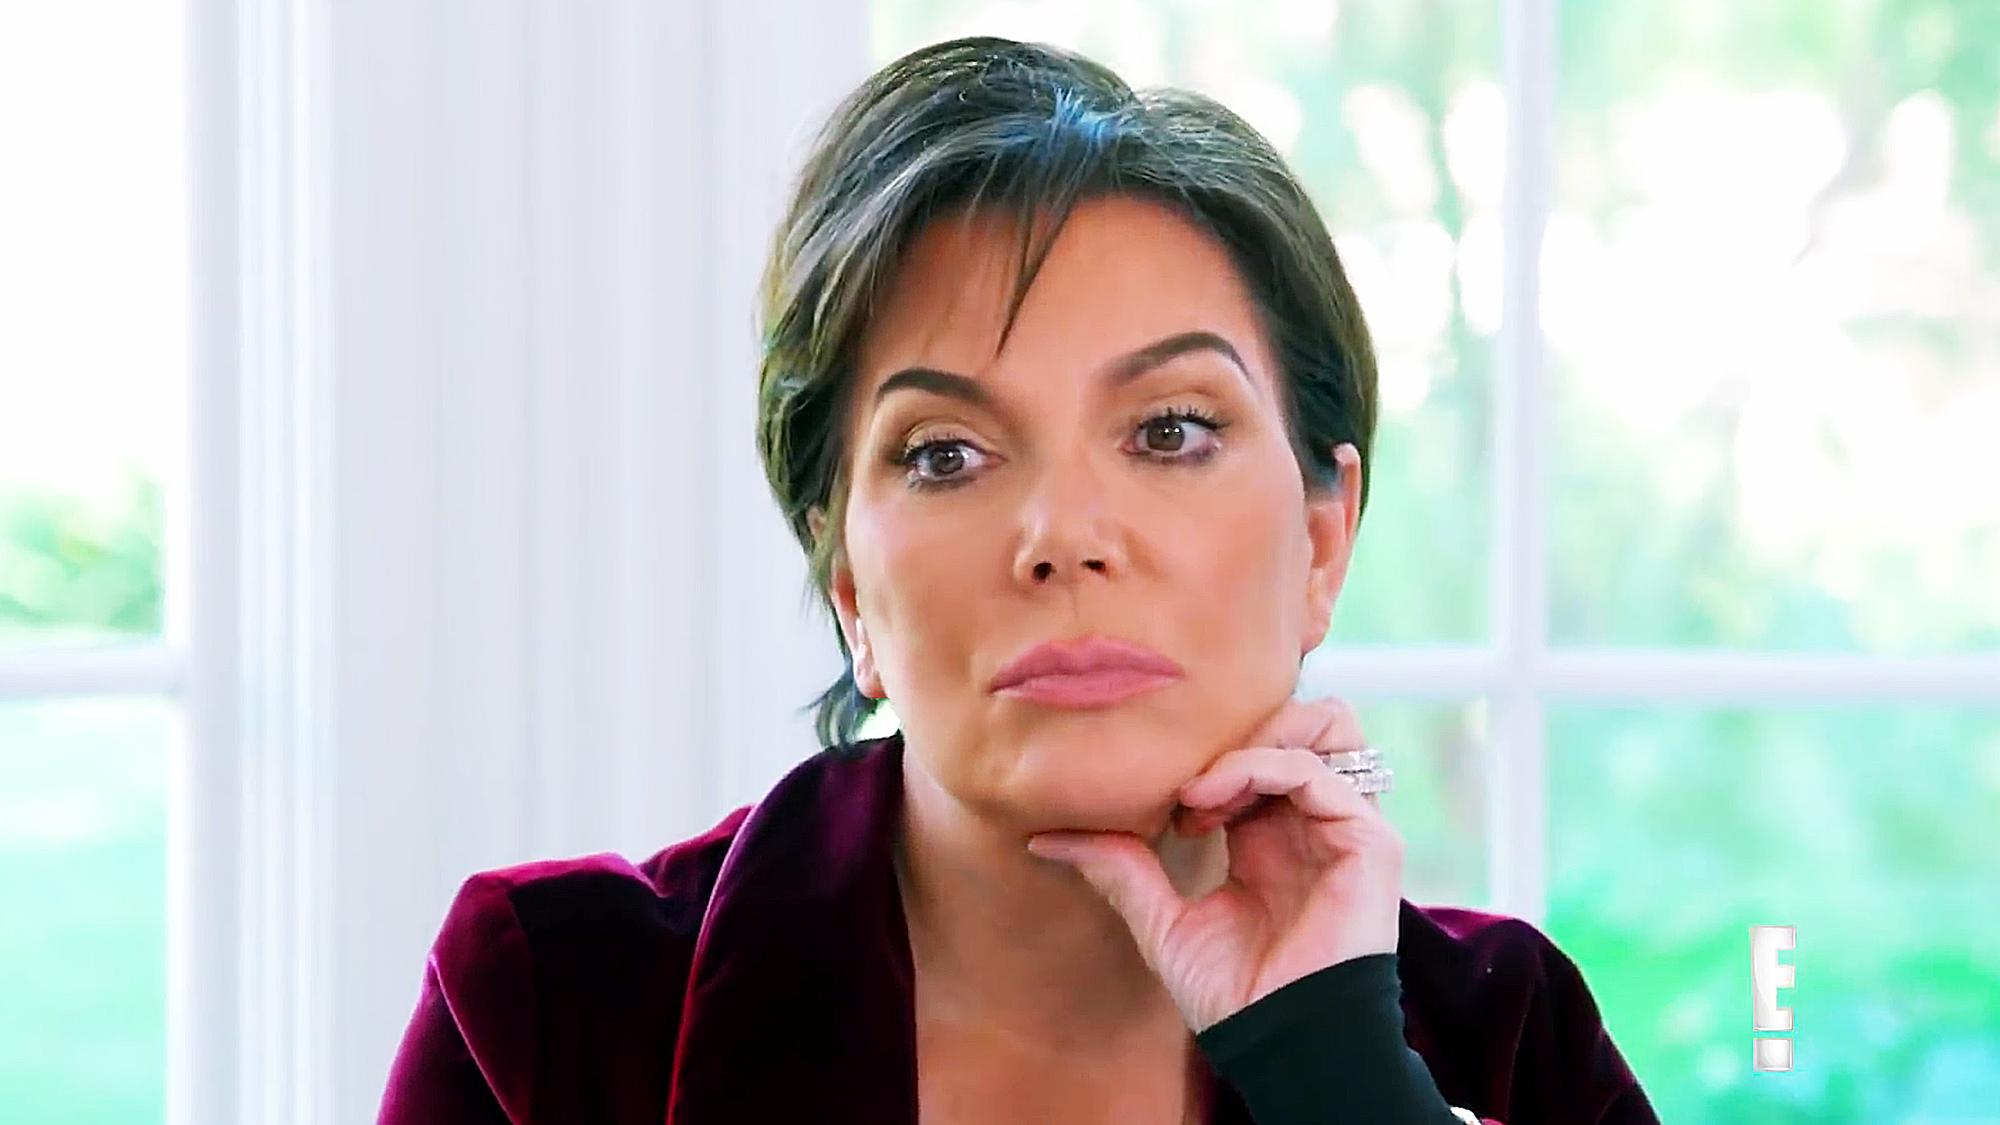 Kris Jenner Kim Kardashian Slams Kourtney Kardashian Entitled